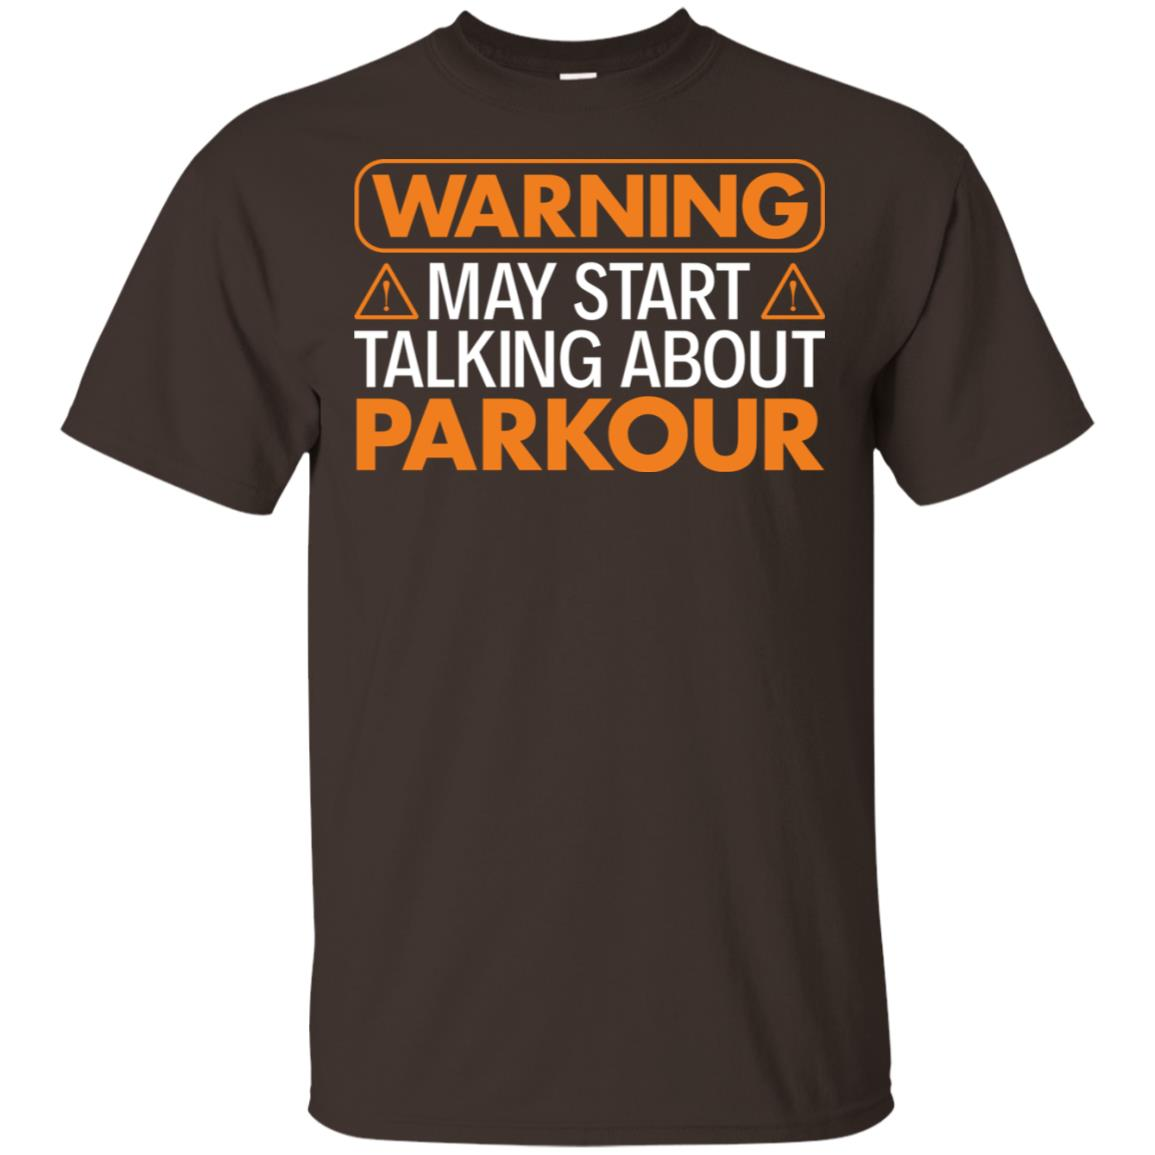 Warning May Start Talking About Parkour Unisex Short Sleeve